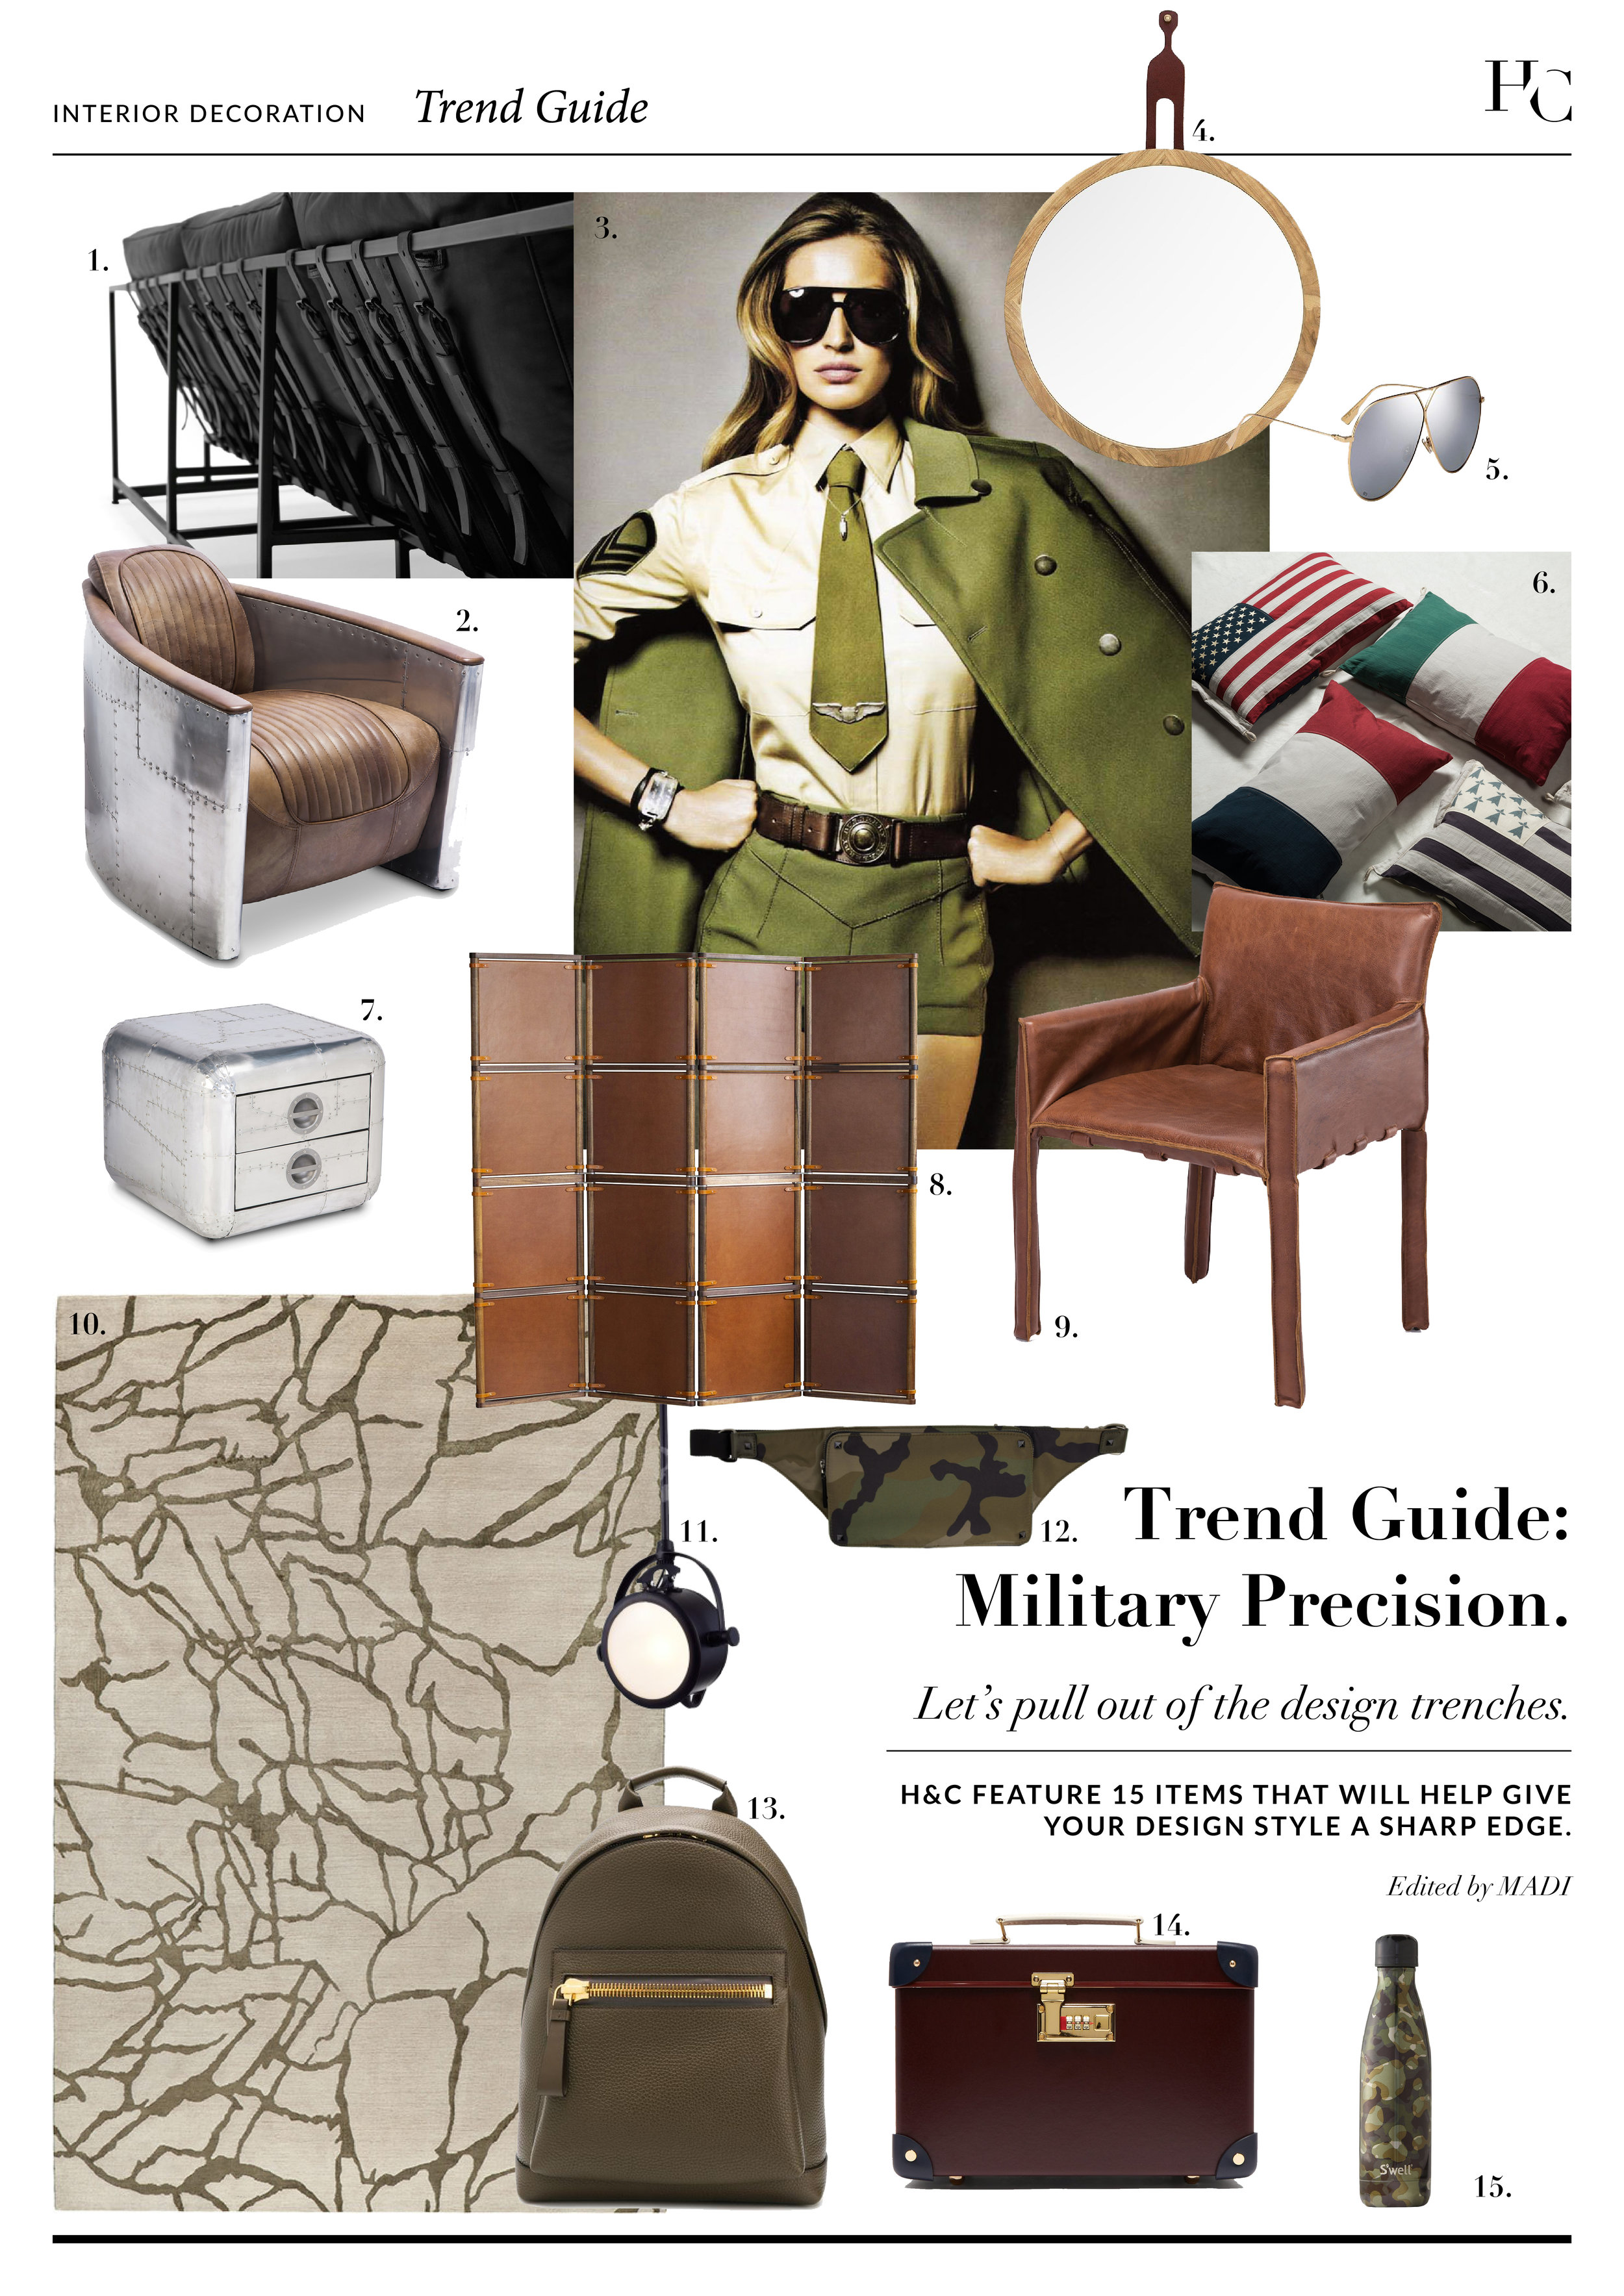 TREND GUIDE, MILITARY PRECISION, HOUSE & COURT, INTERIOR DESIGN SYDNEY.jpg